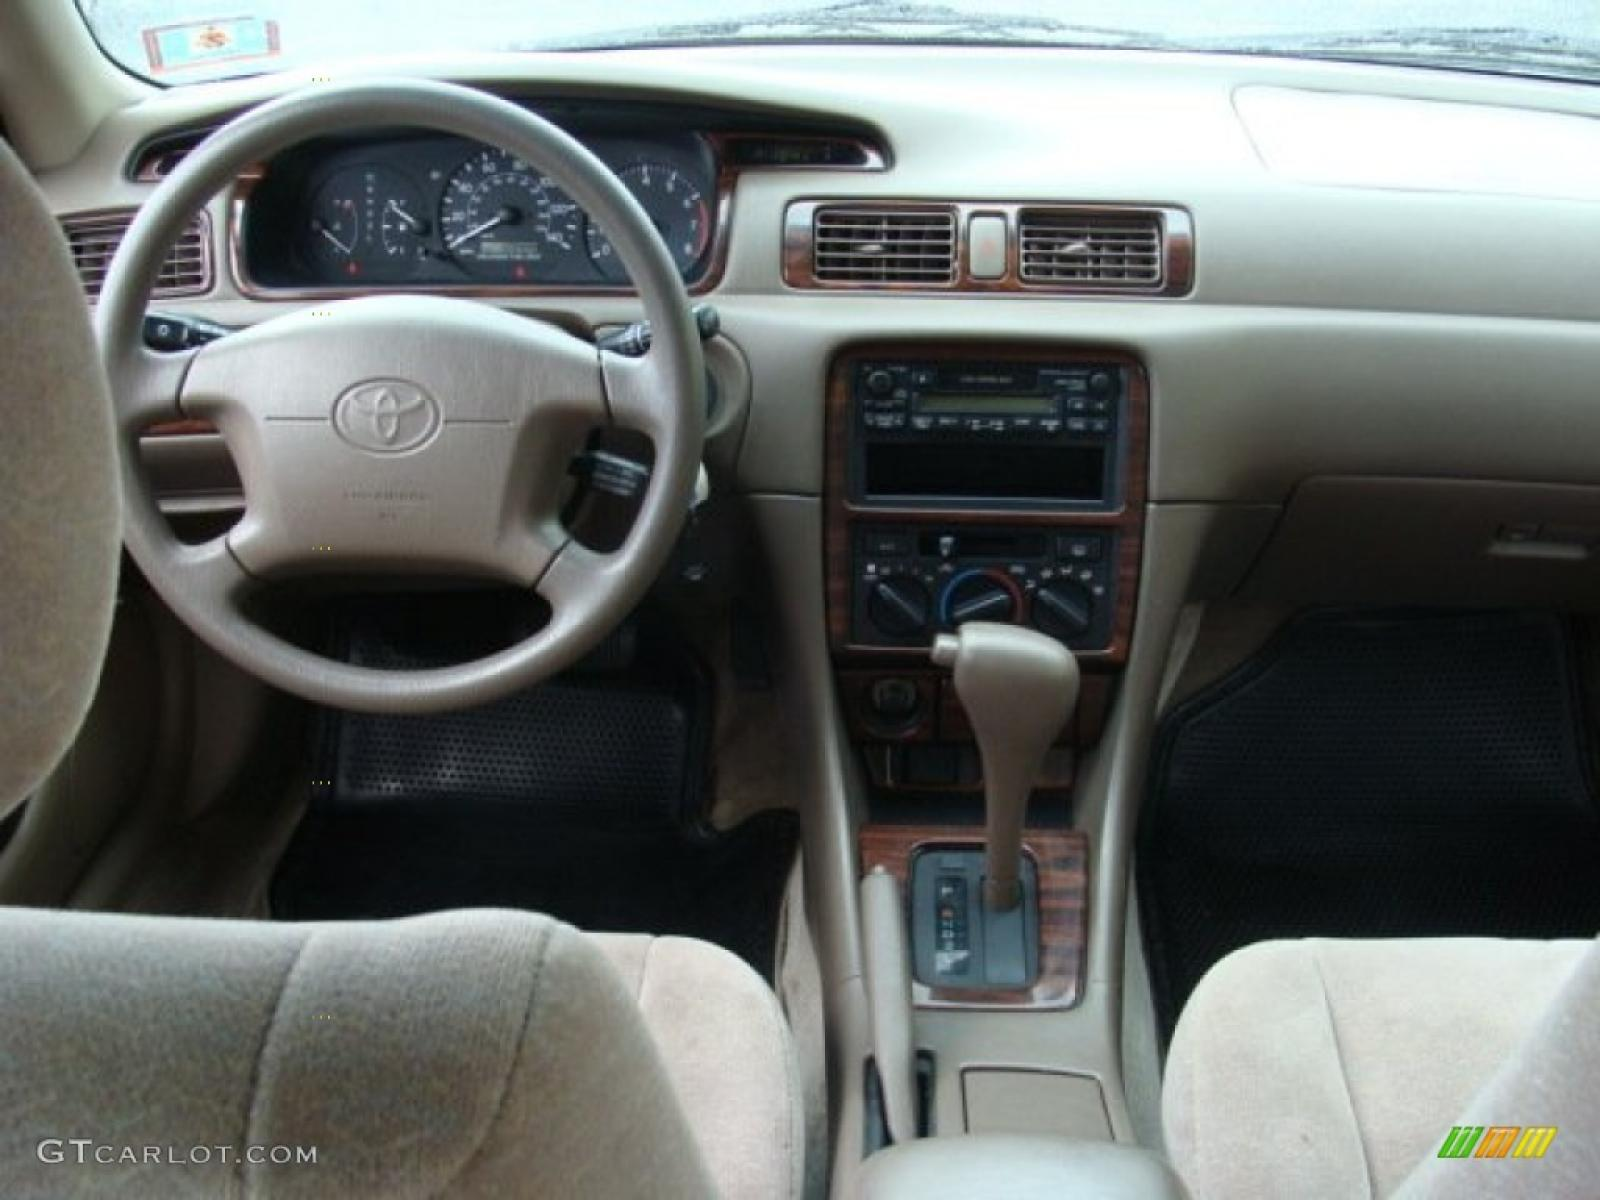 800 1024 1280 1600 origin 1998 Toyota Camry ...